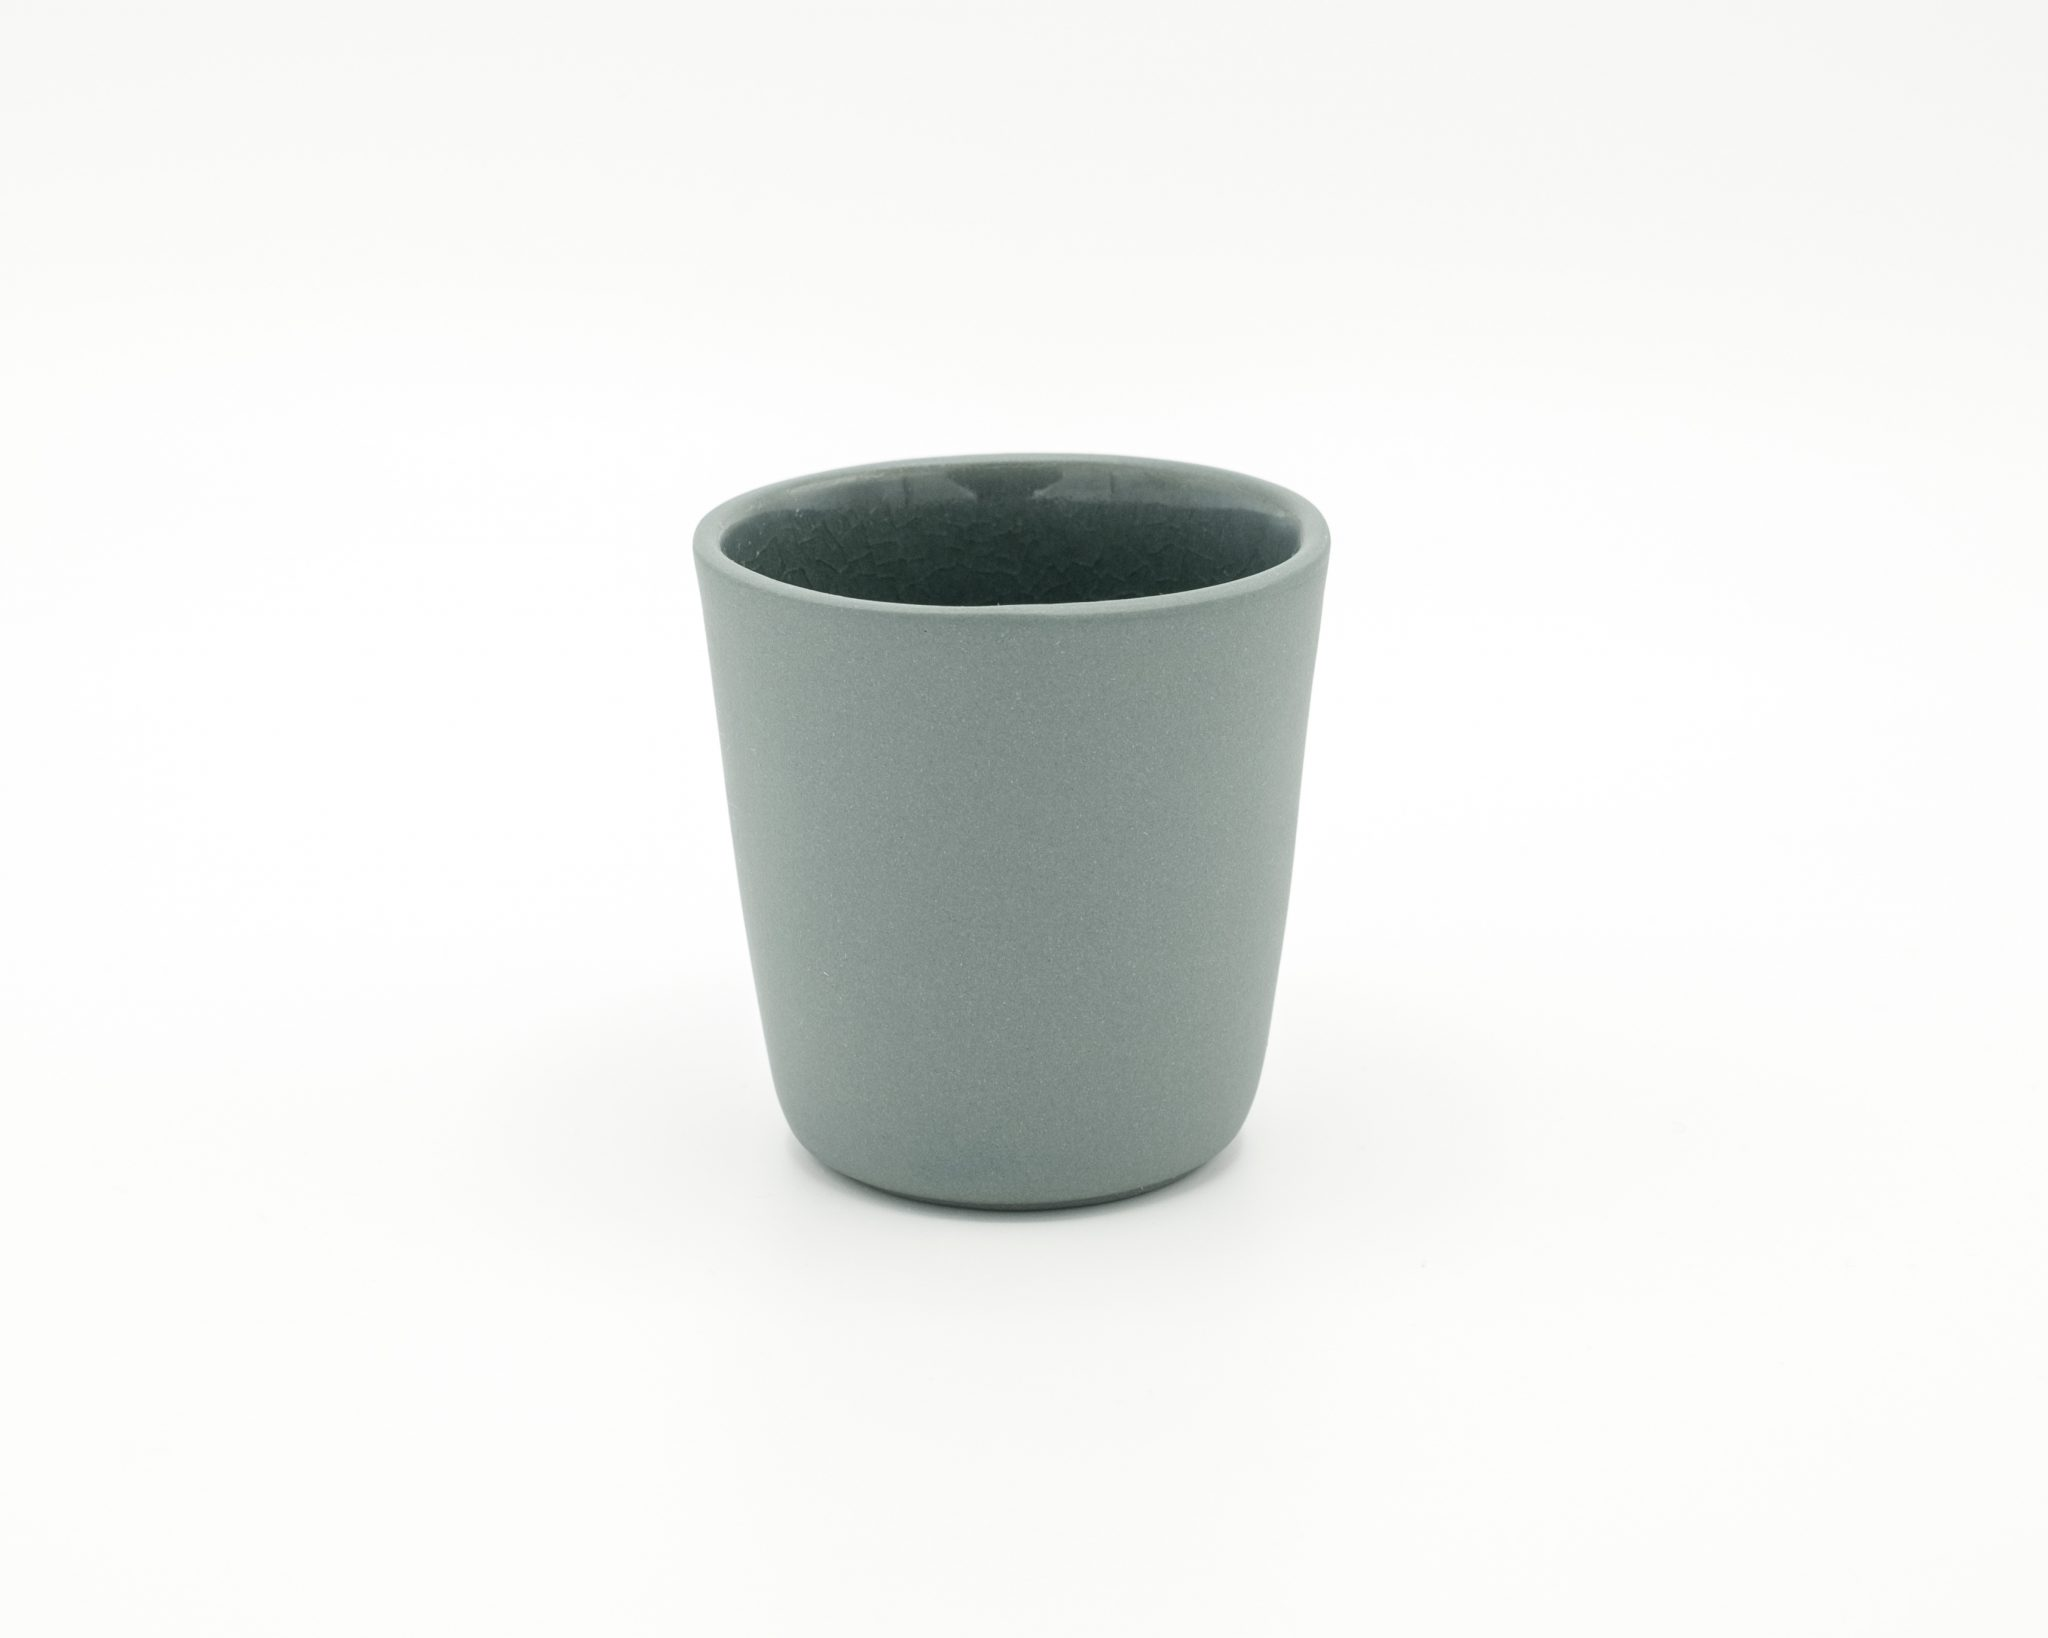 handmade porcelain espresso cup recycled